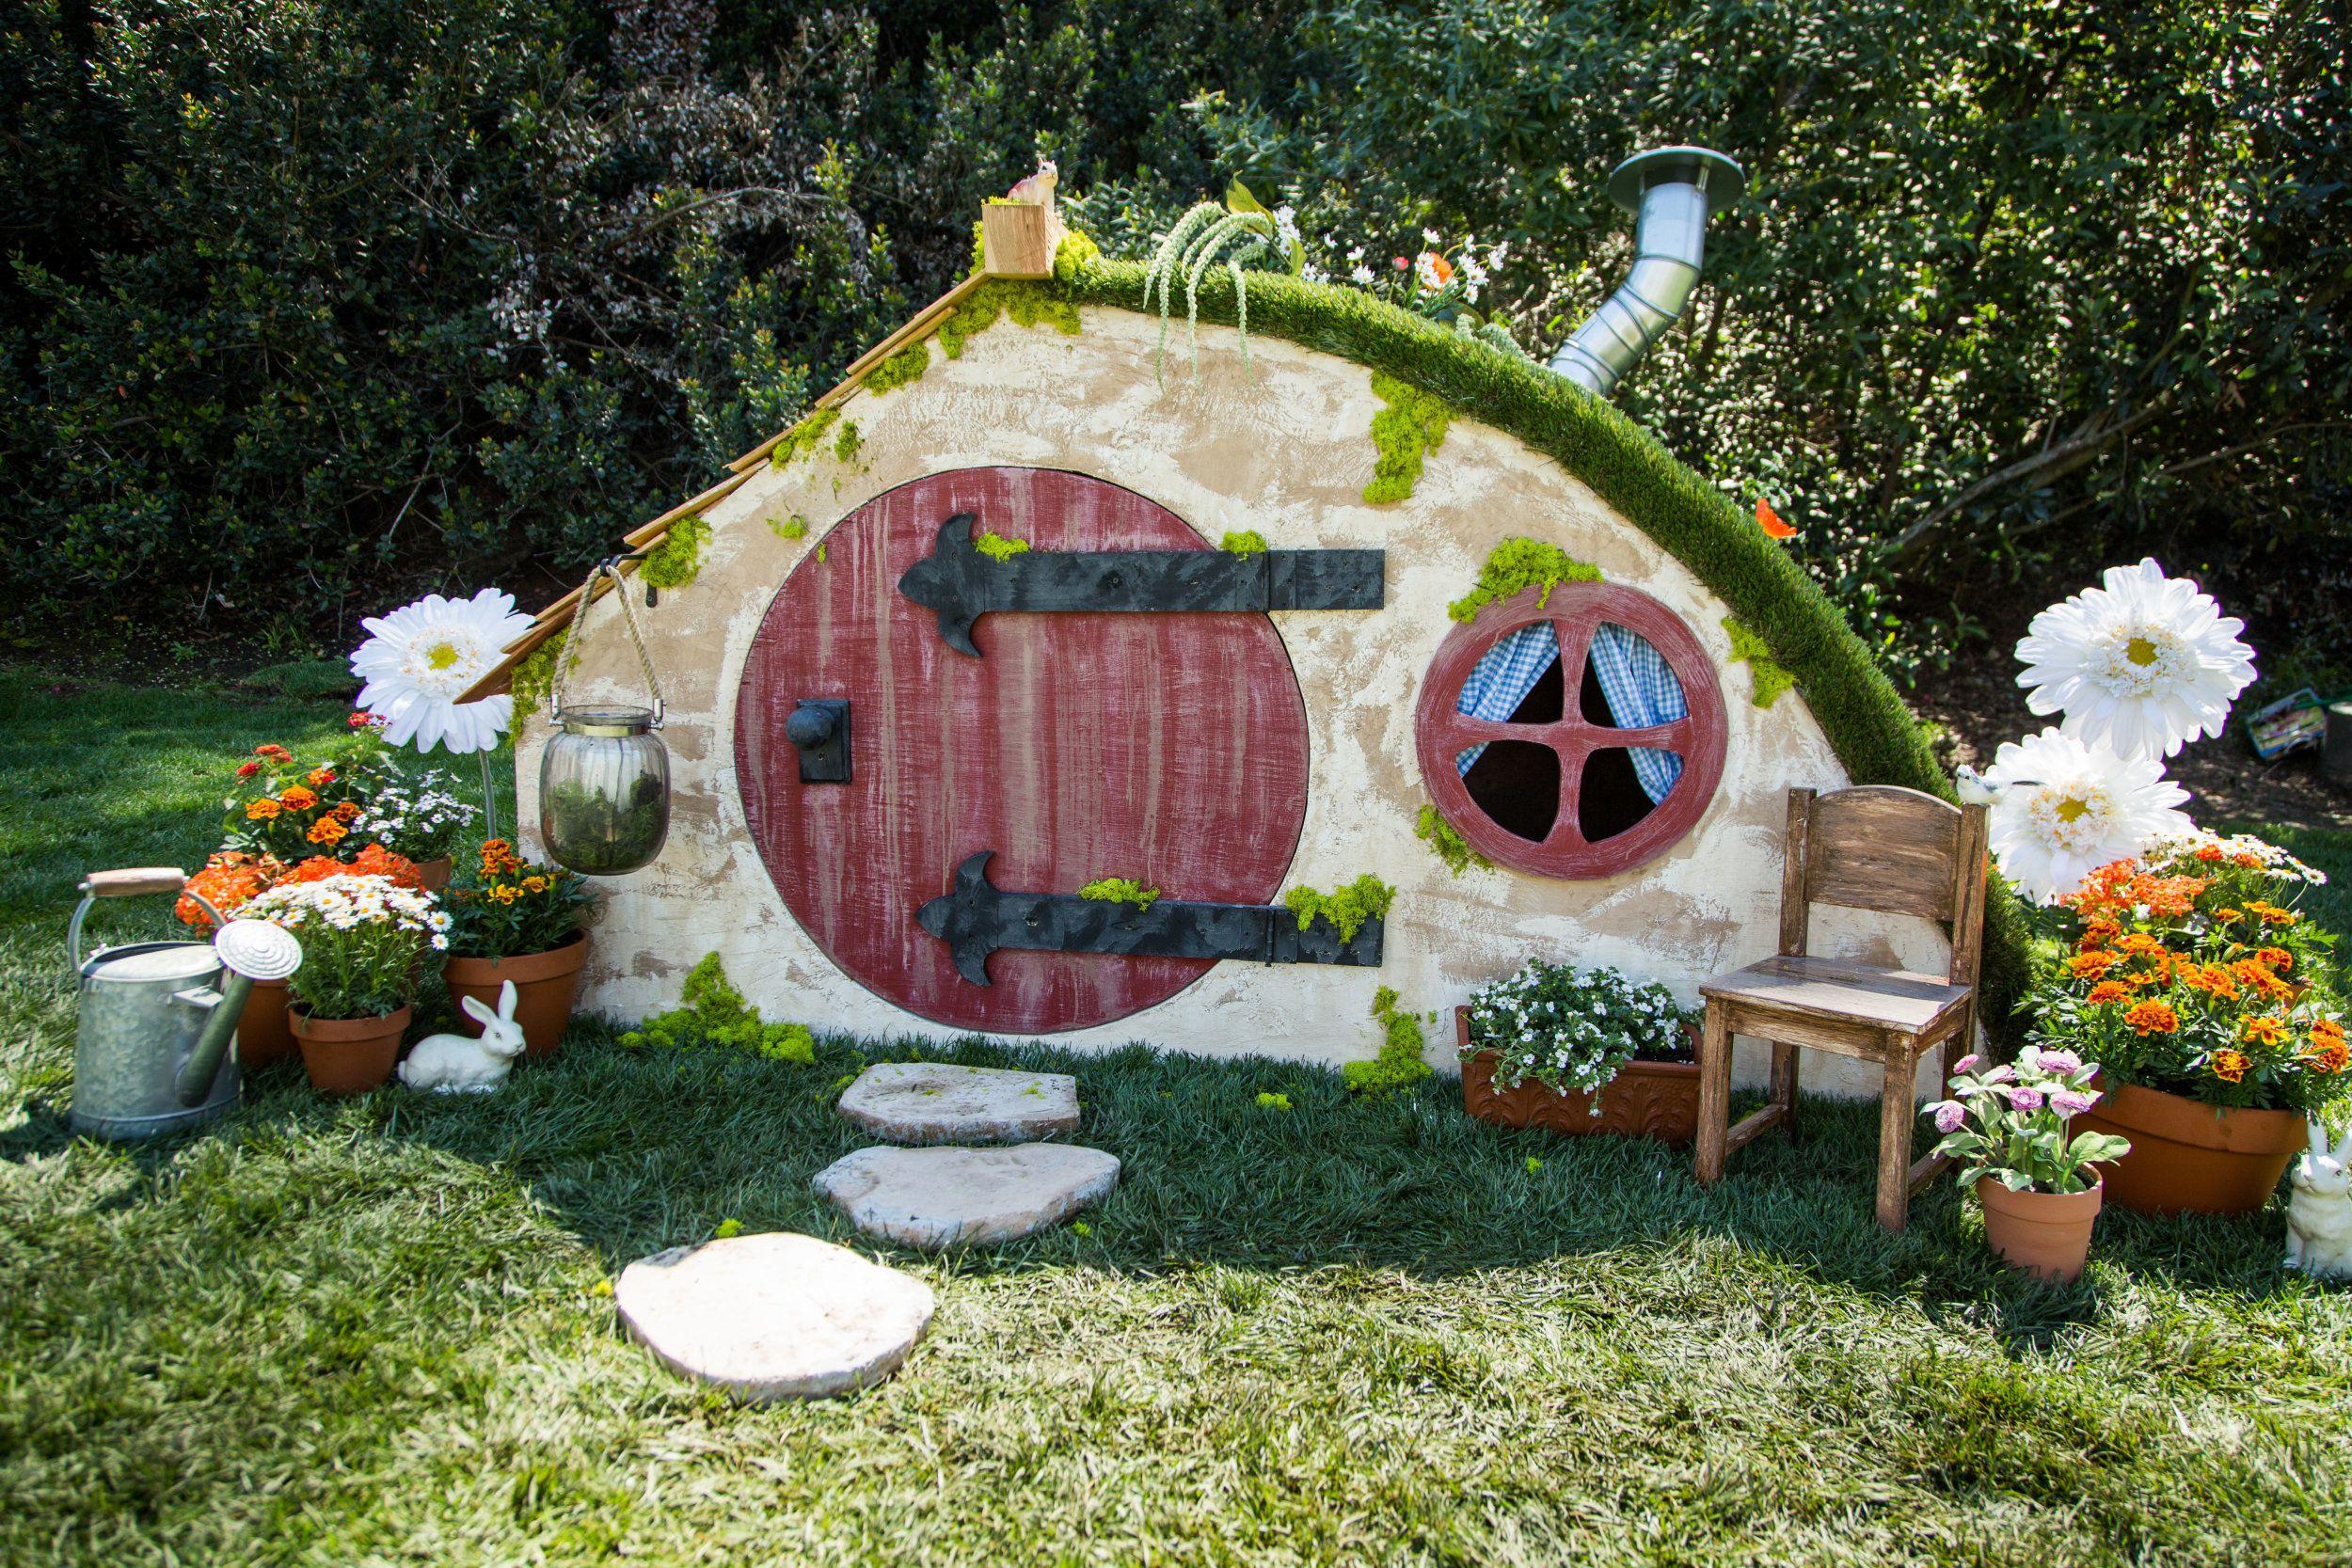 How To Diy Hobbit Hole Playhouse Home Family Hallmark